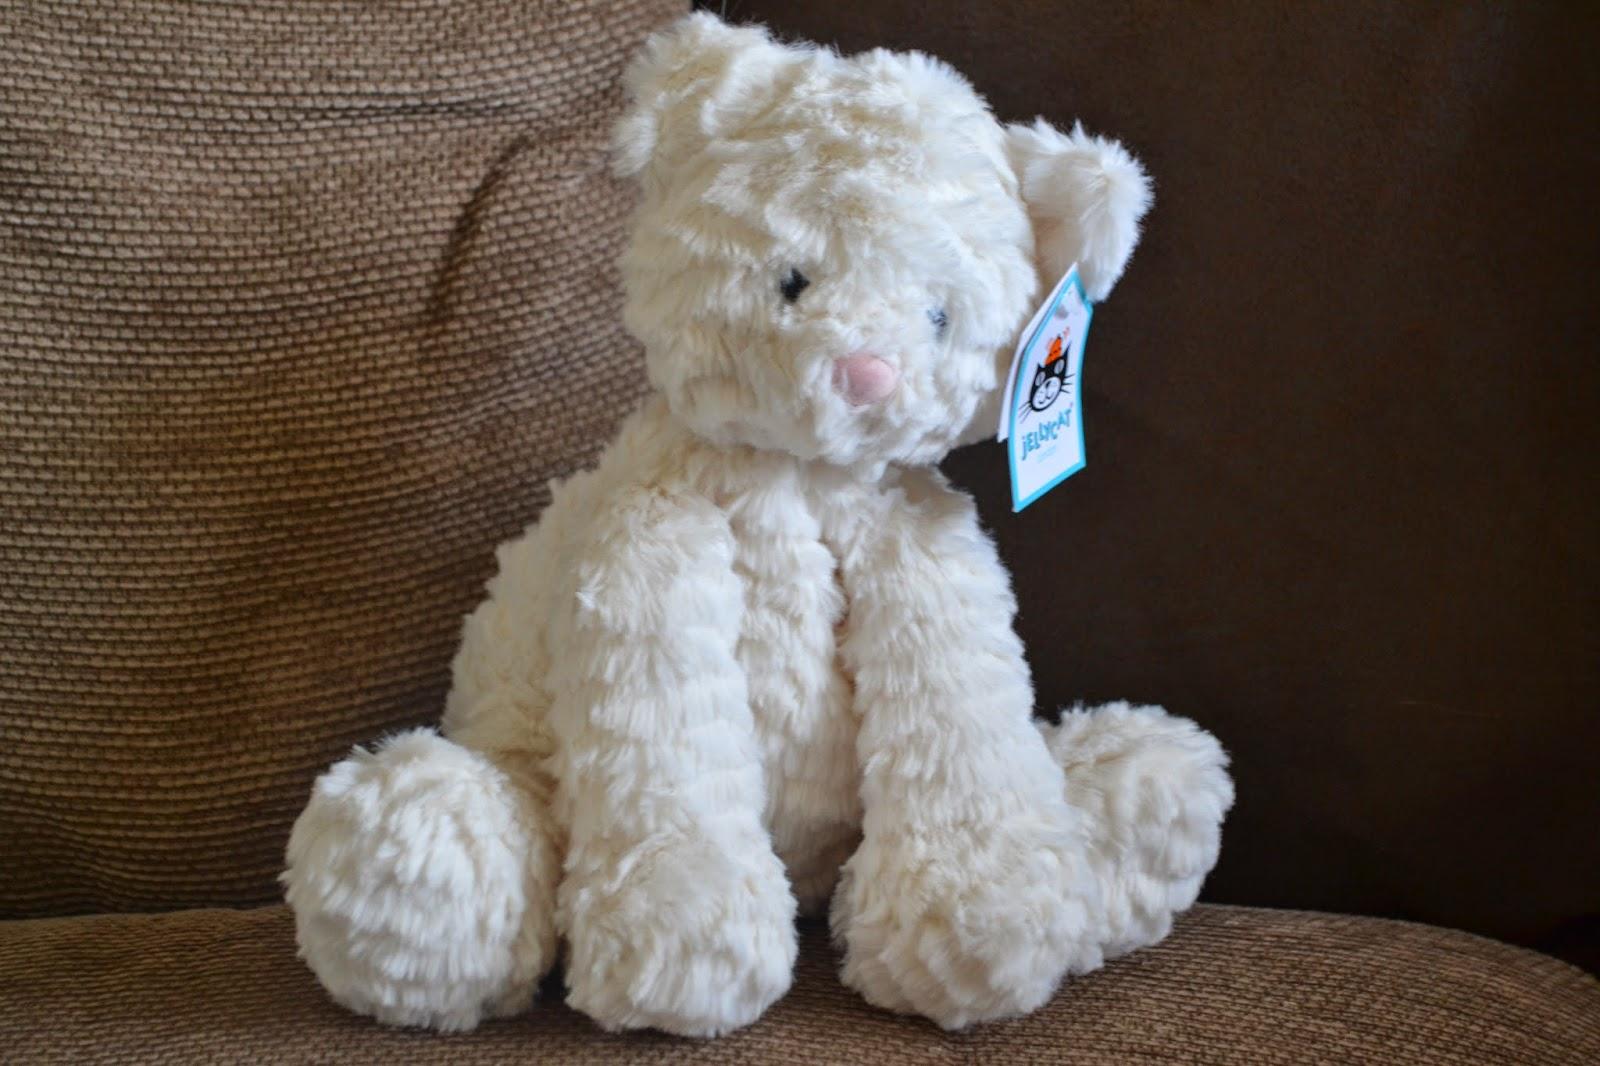 LPS Toys - Littlest Pet Shop Toys - Girls Toys